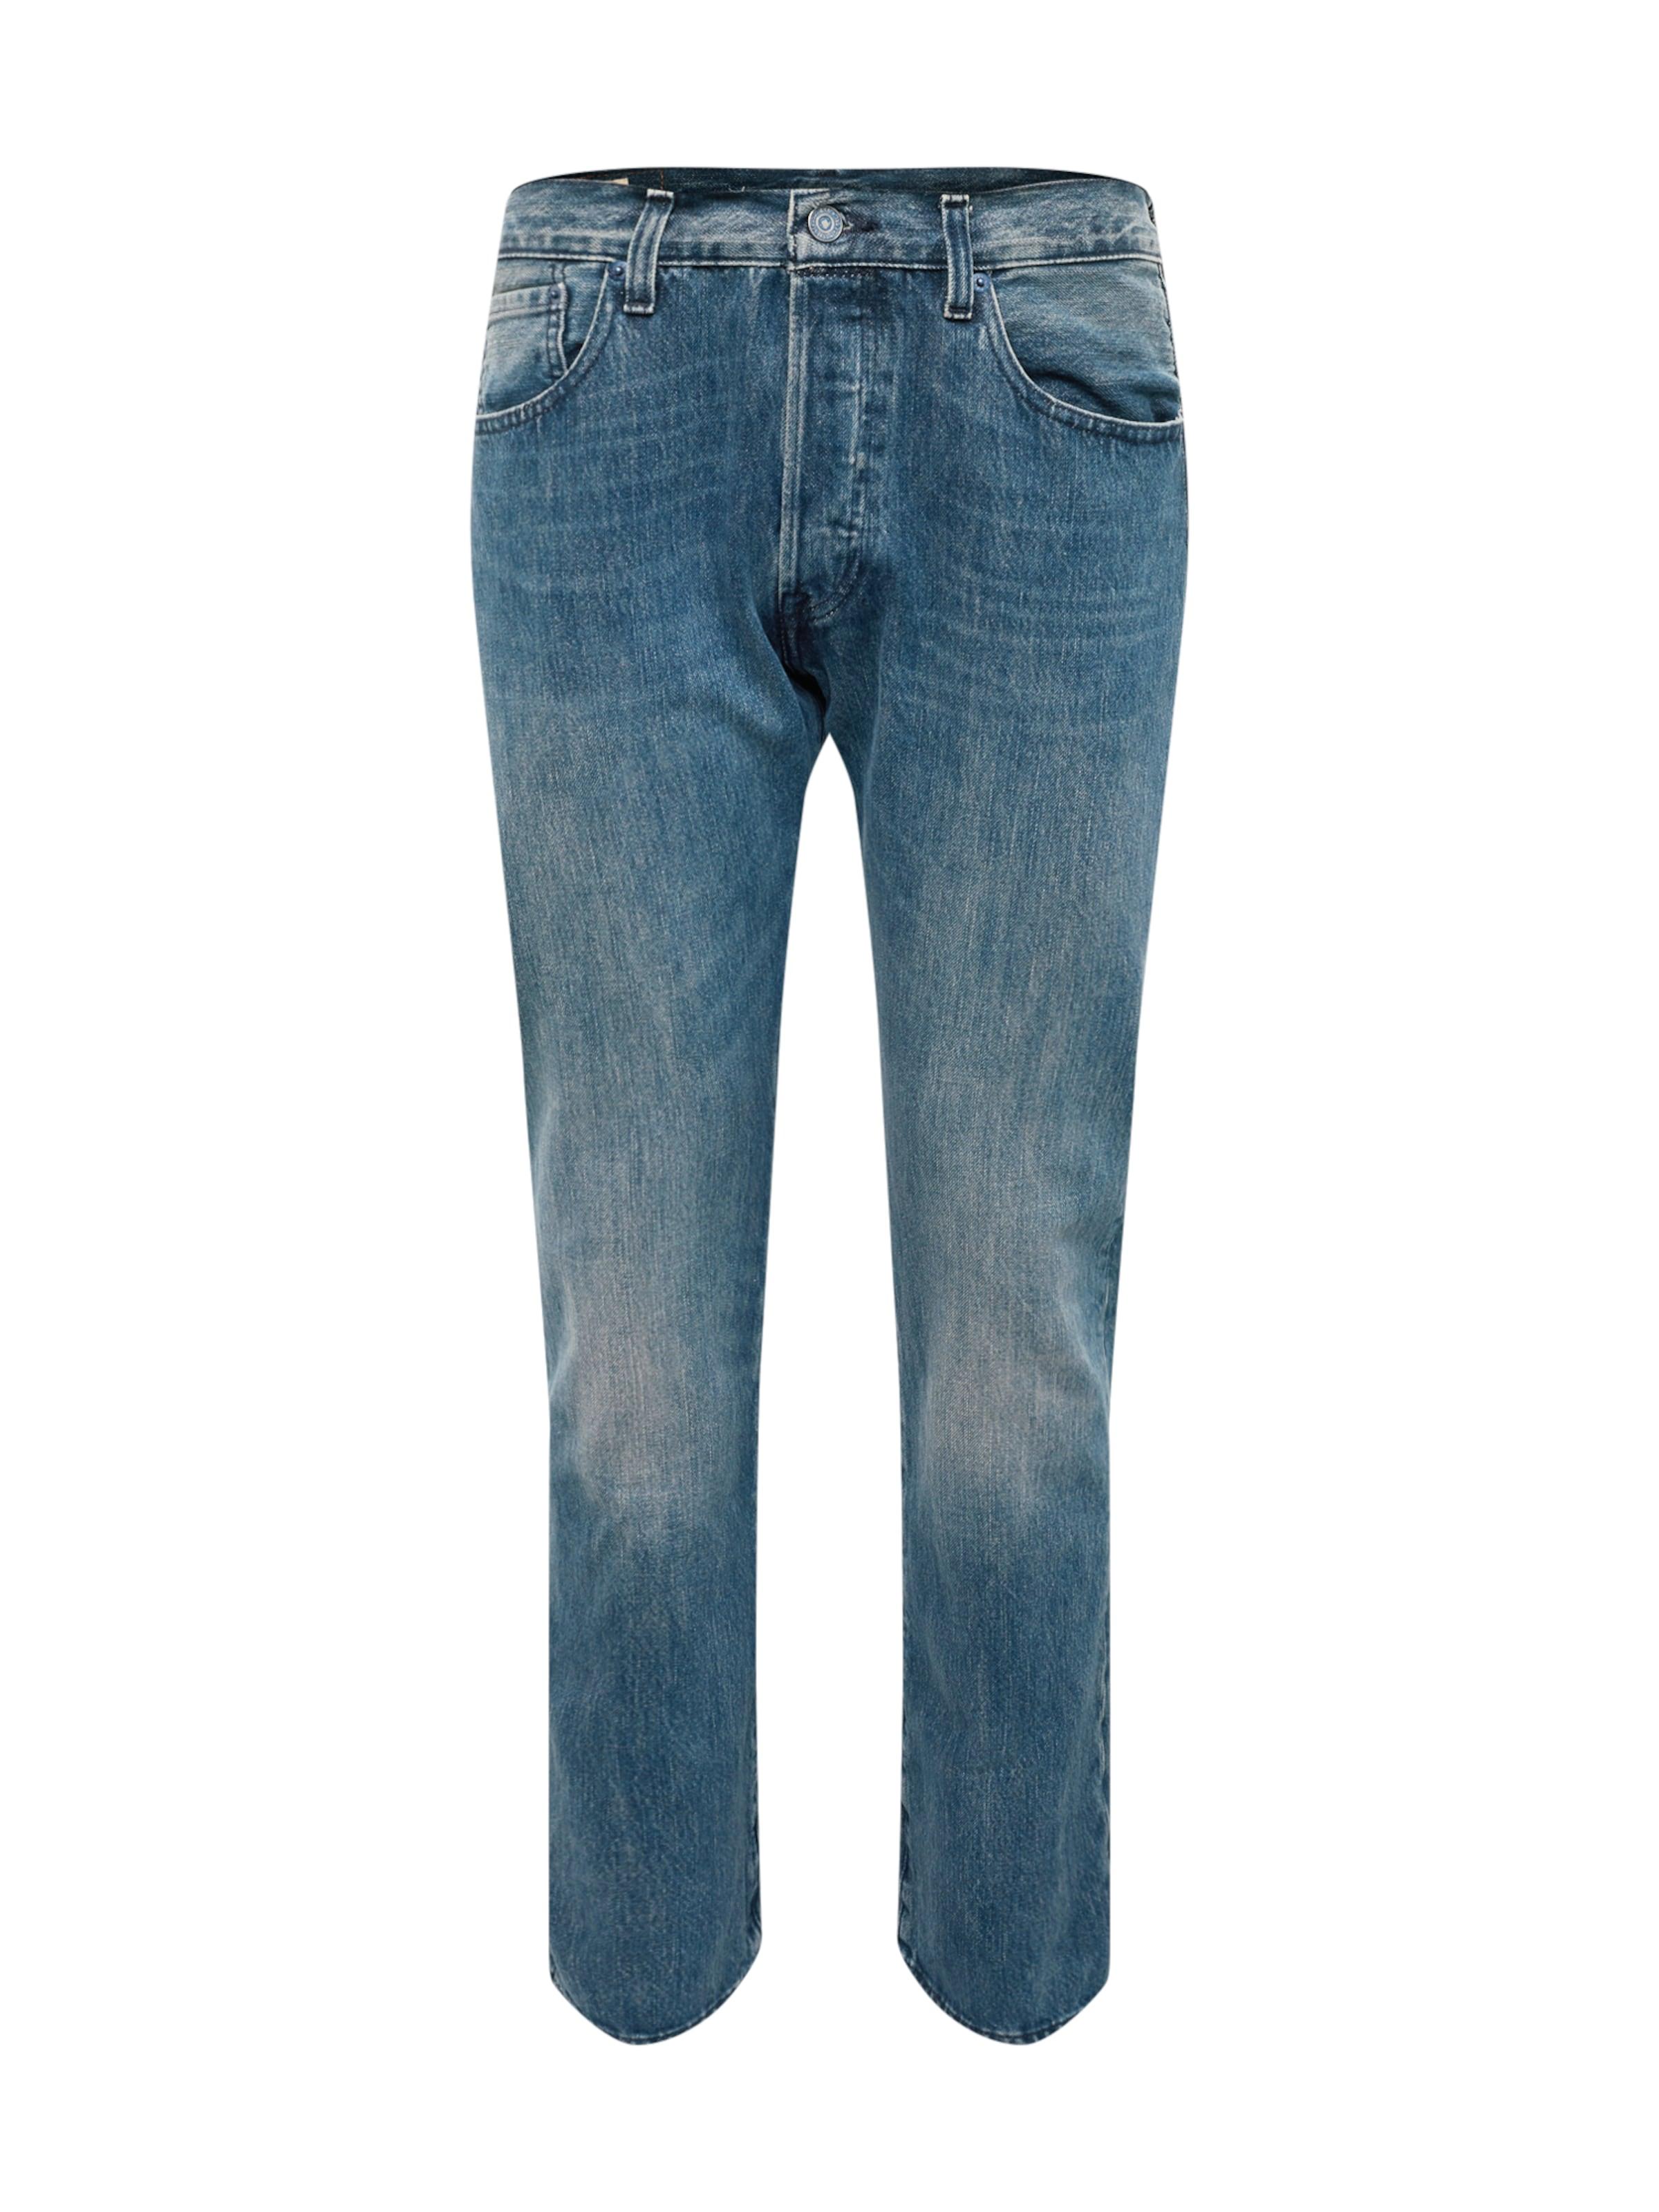 Levi's Denim Jean Fit' Bleu En Original '501 bf76gvYy